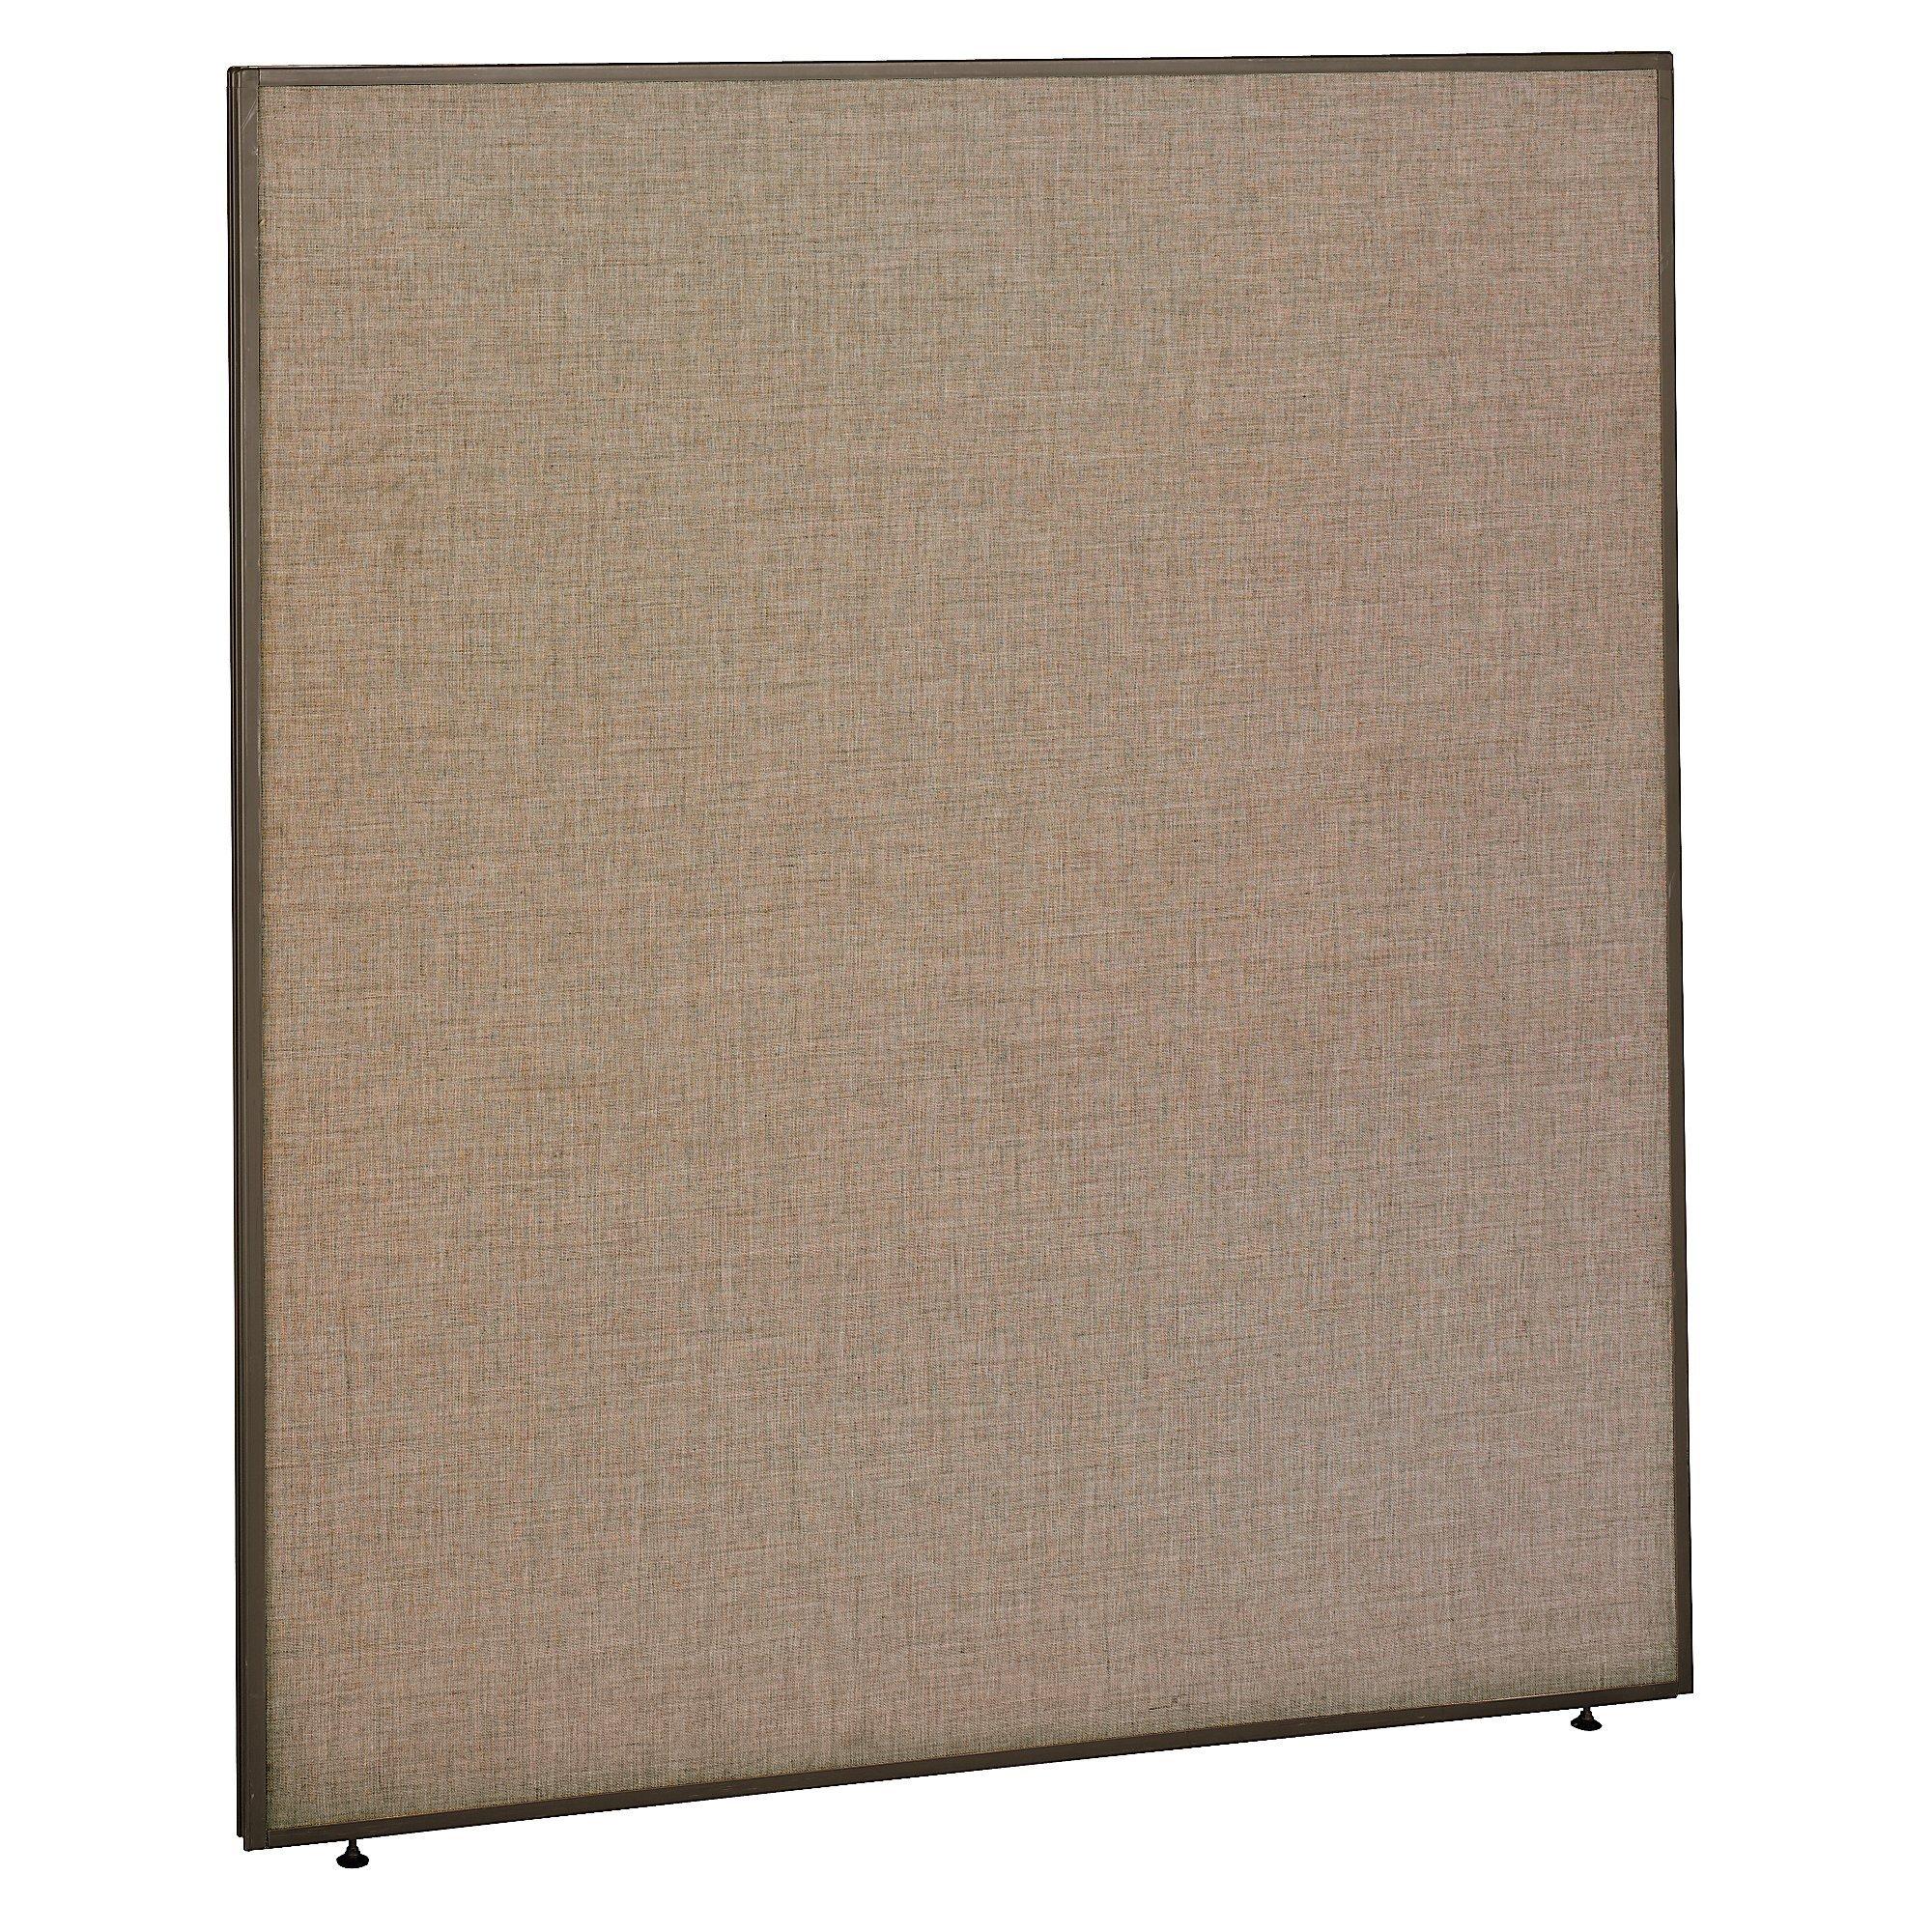 Bush Business Furniture ProPanels - 66H x 60W Panel in Harvest Tan